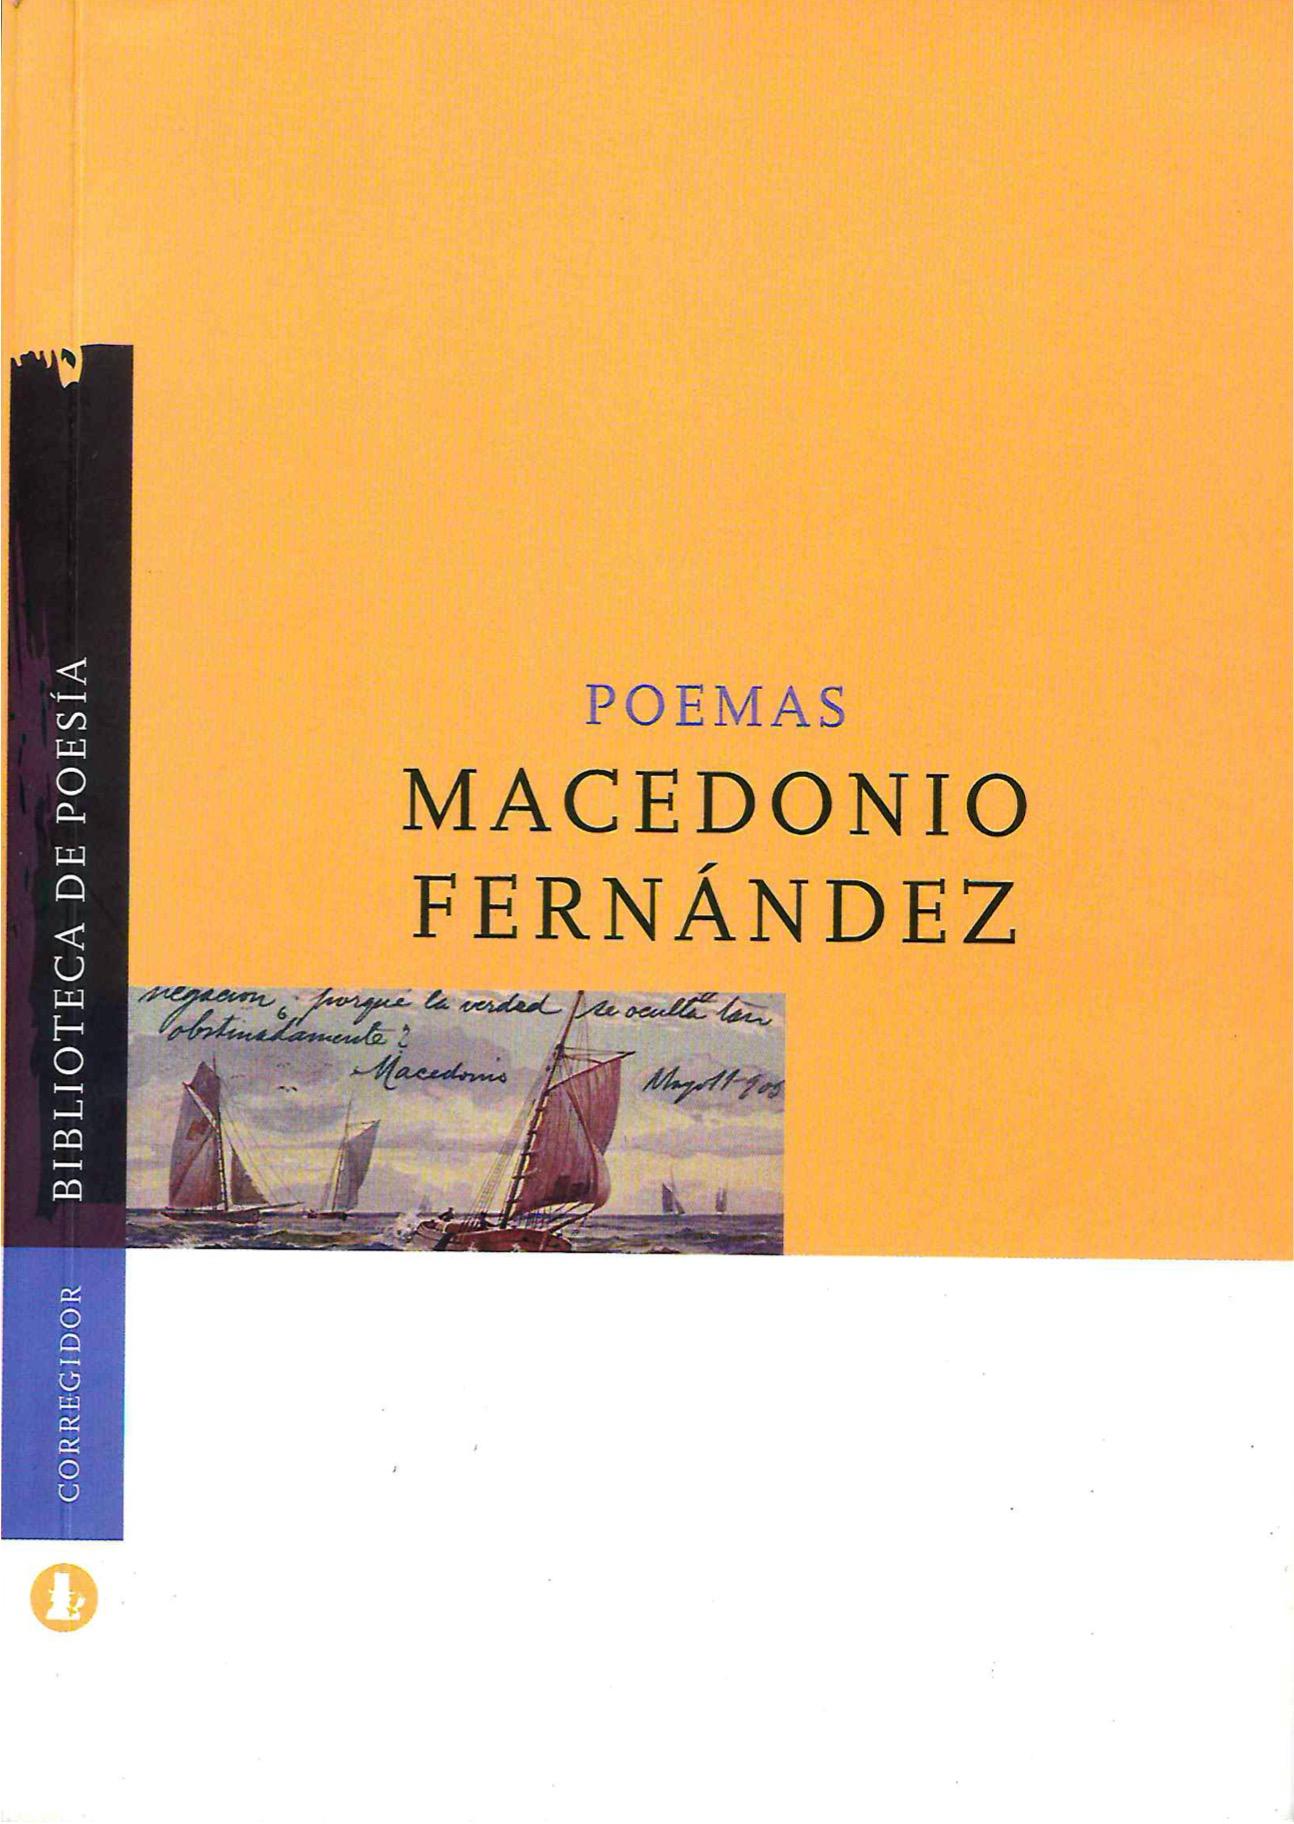 Poemas - Macedonio Fernandez pdf